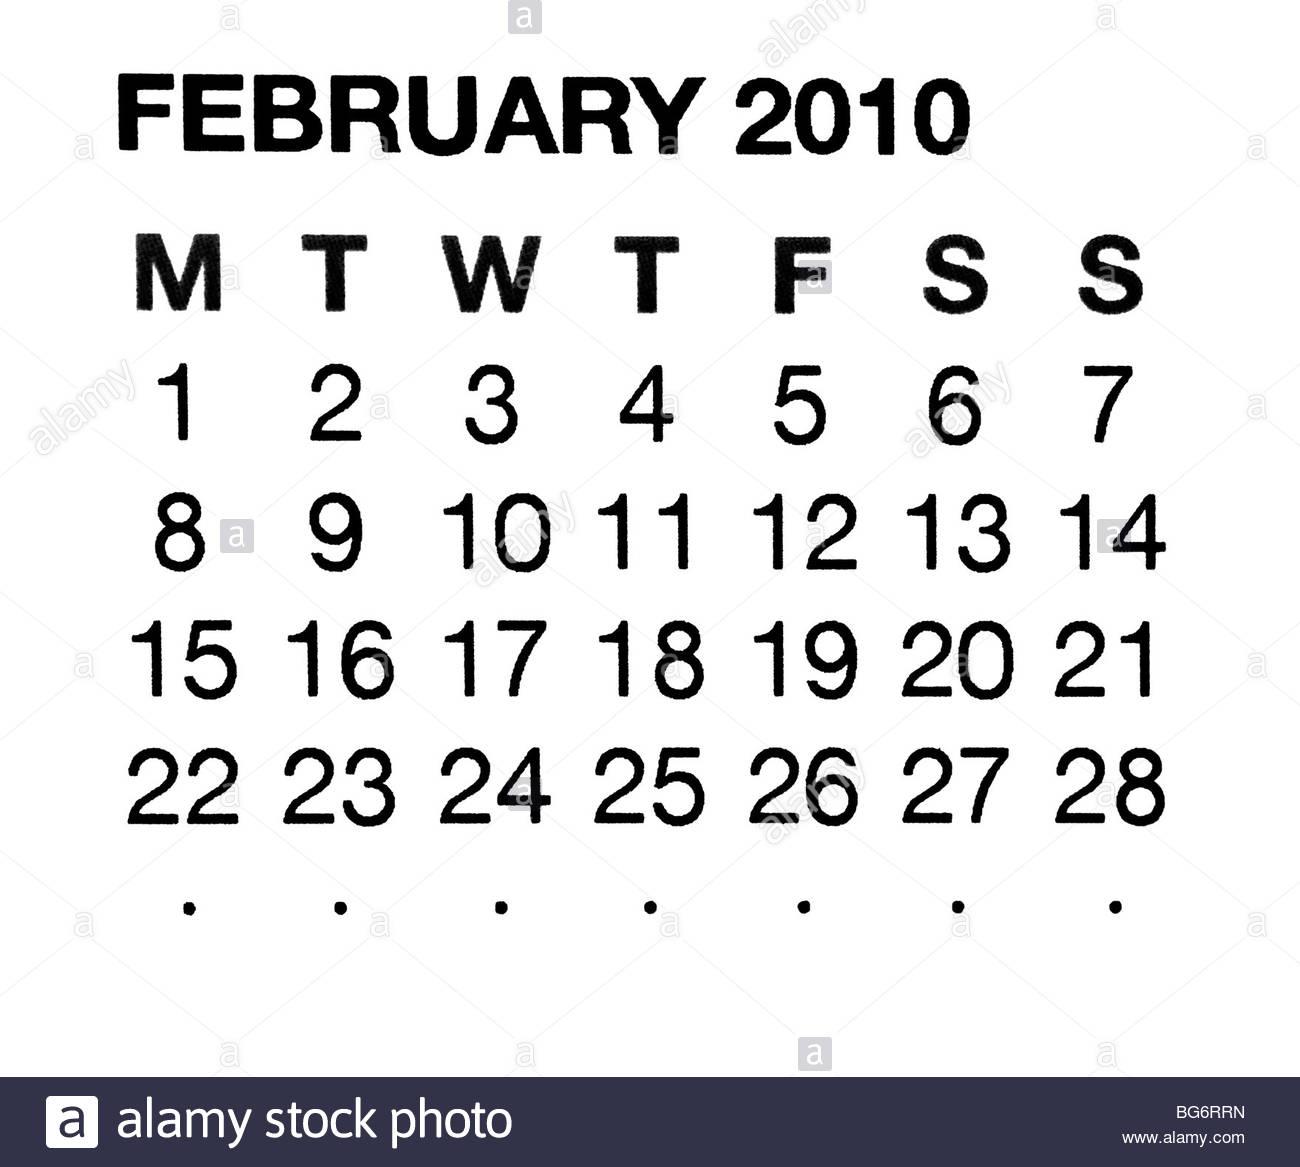 February 2010 calendar - Stock Image